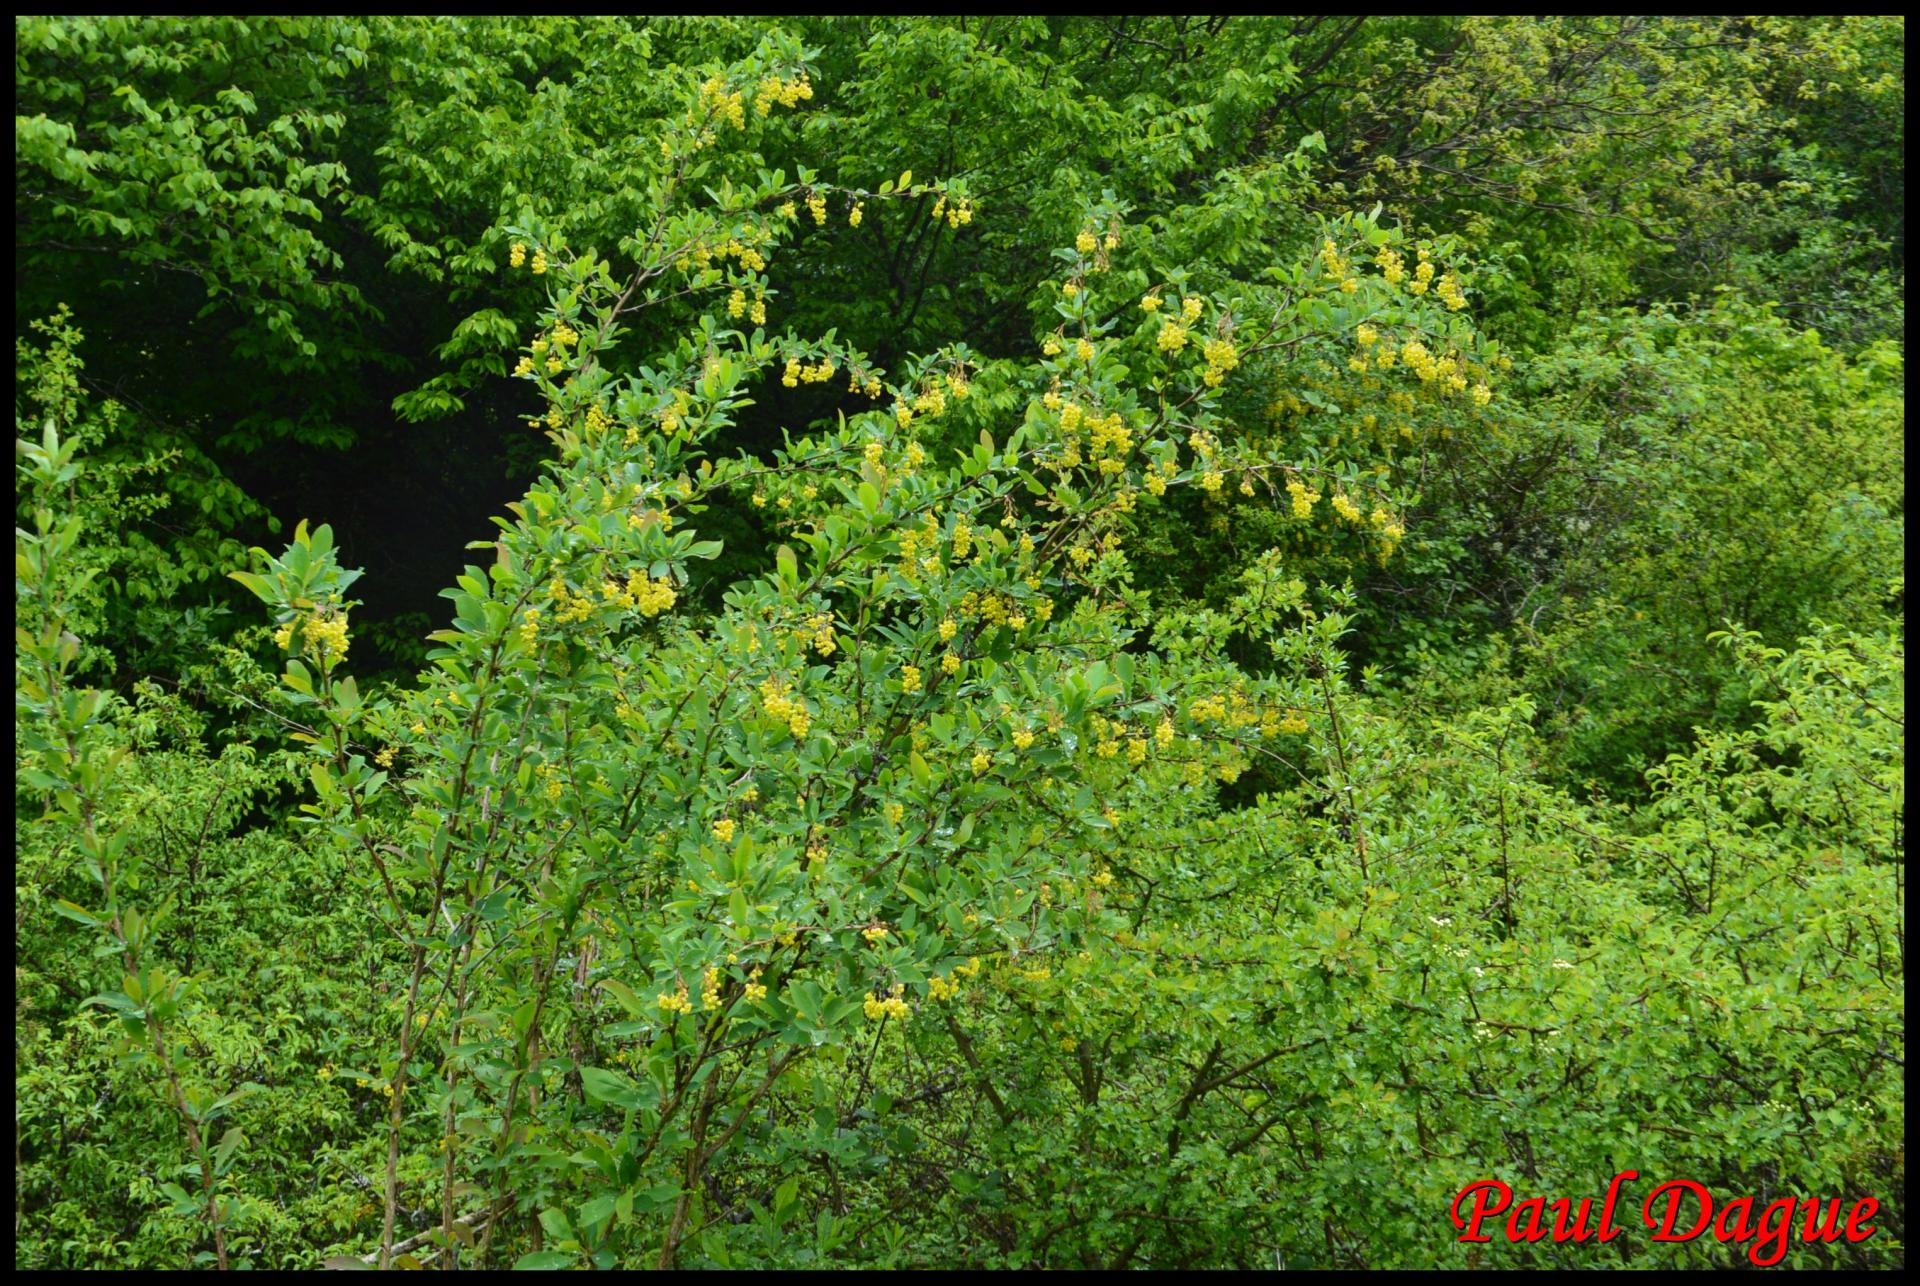 349 epine vinette berberis vulgaris berberidaceae